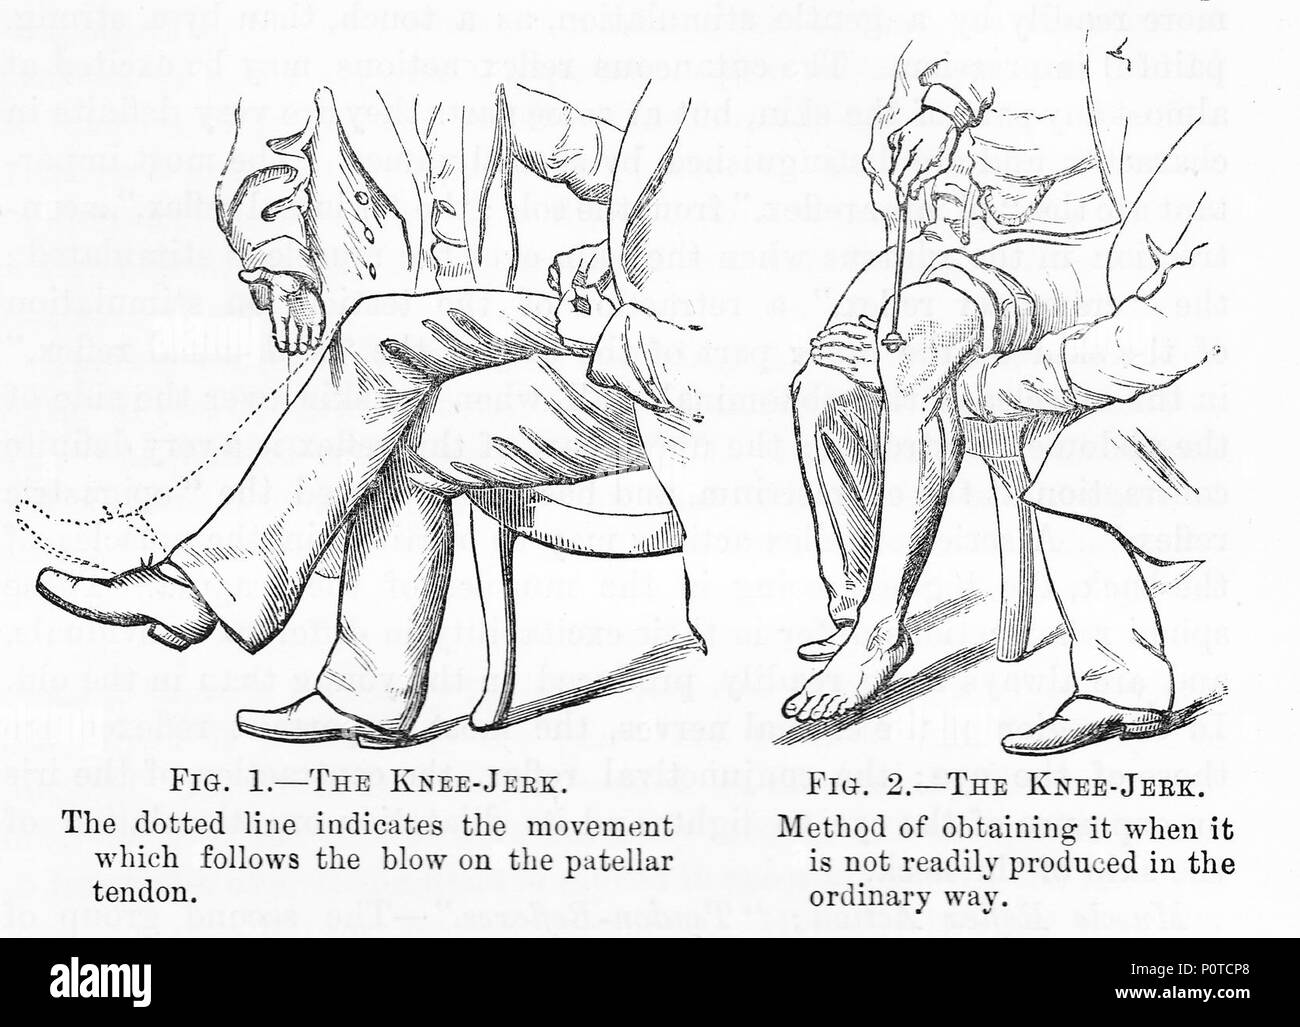 Knee Jerk Stock Photos & Knee Jerk Stock Images - Alamy